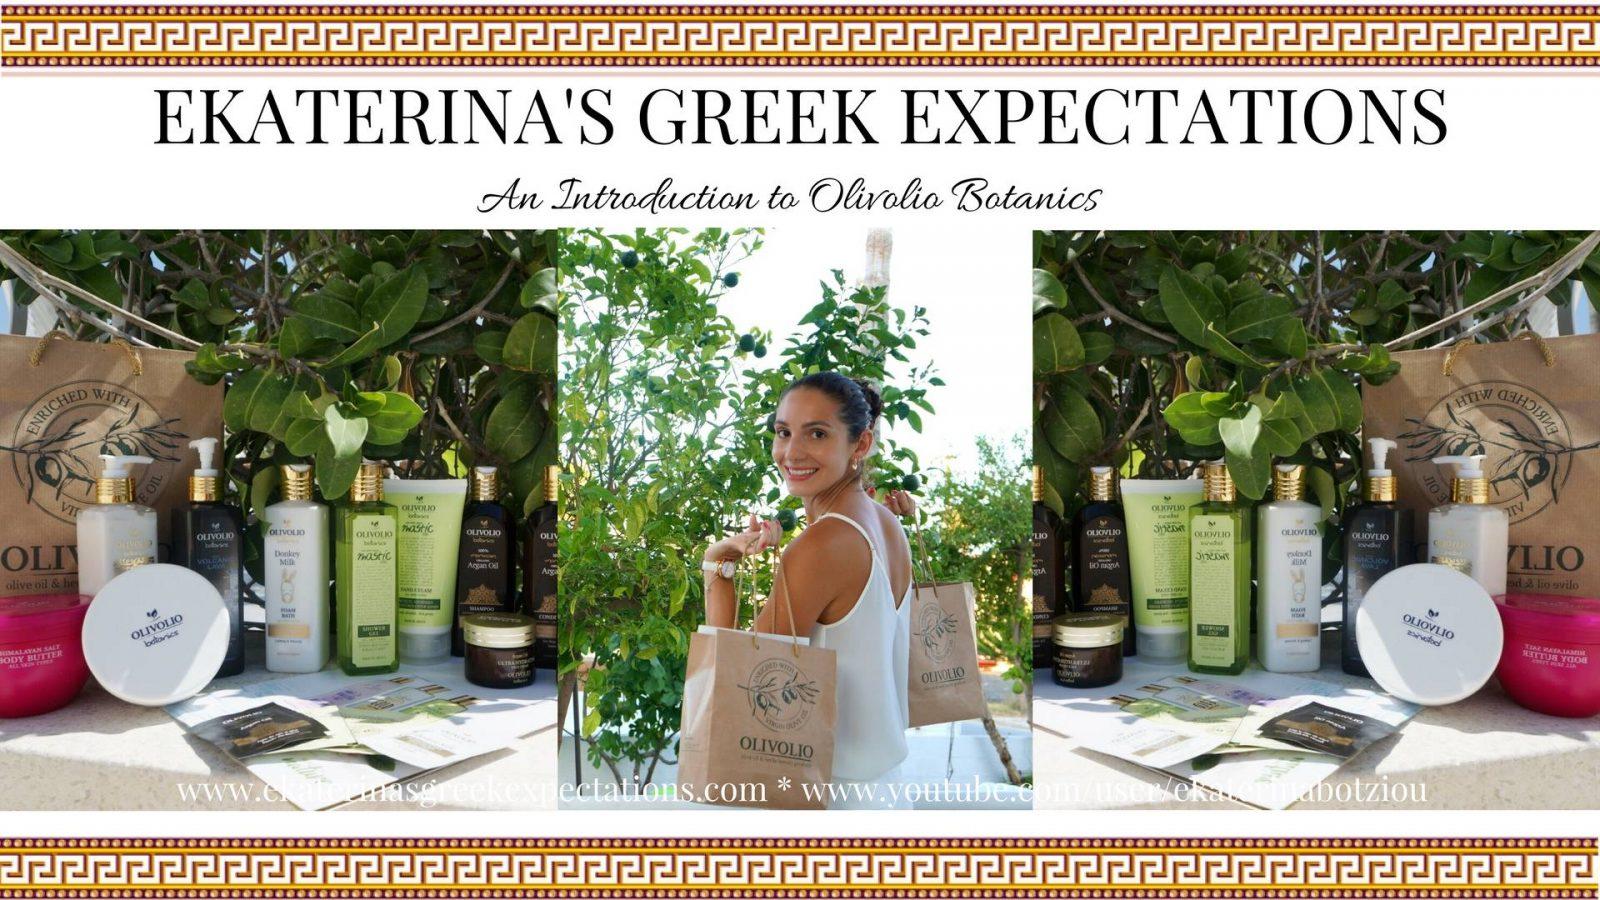 An Introduction to Olivolio Botanics Natural Greek Cosmetics: VLOG